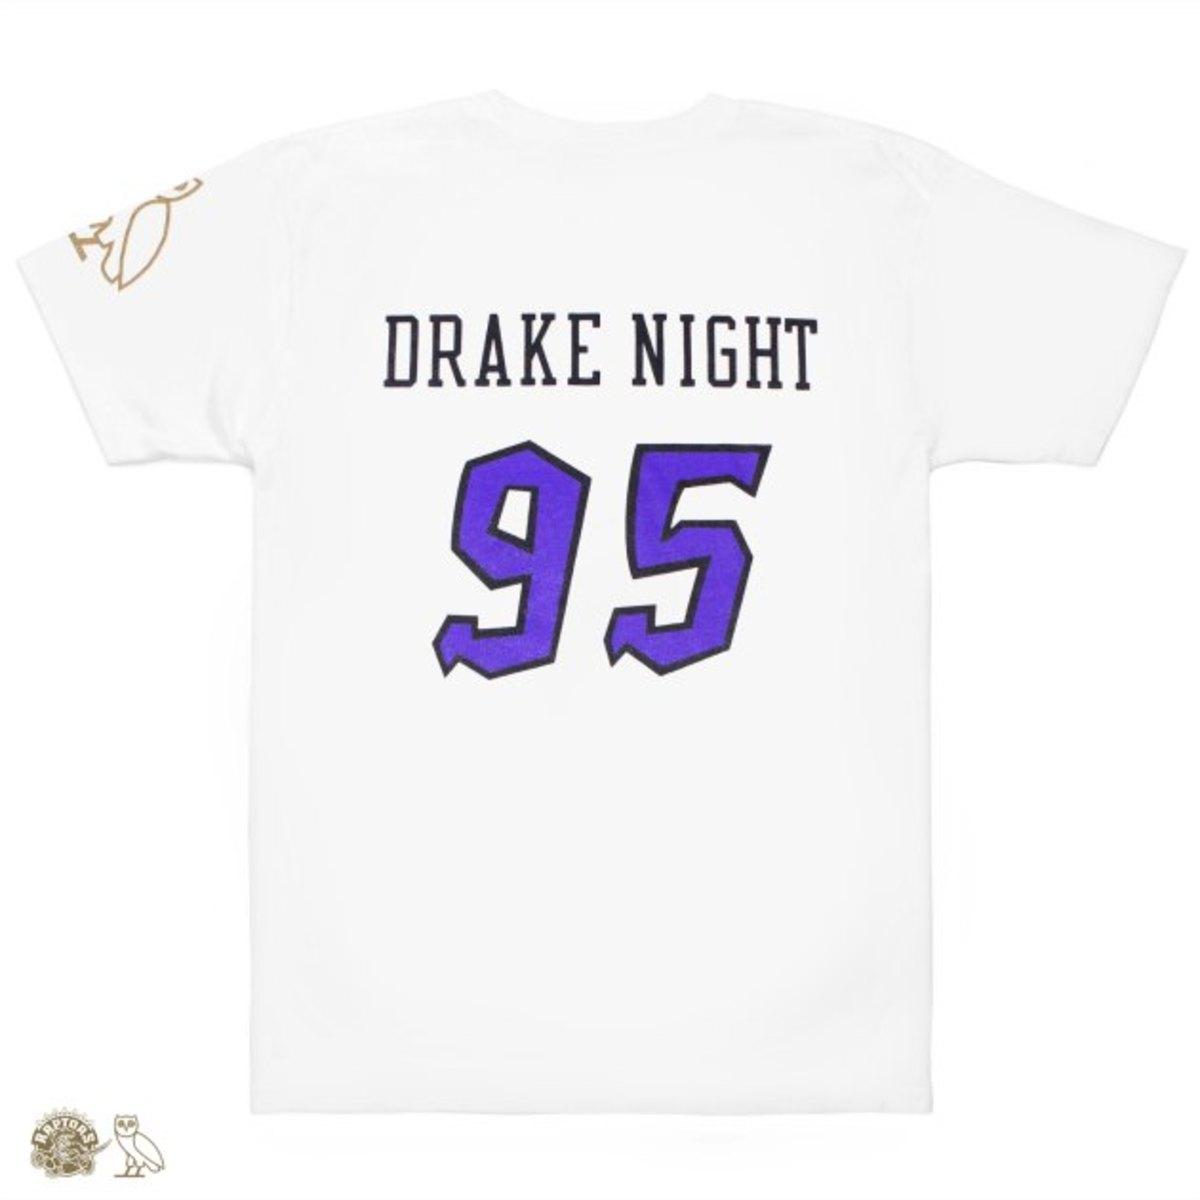 Drake-toronto-Raptors-t-shirt-Back.jpg